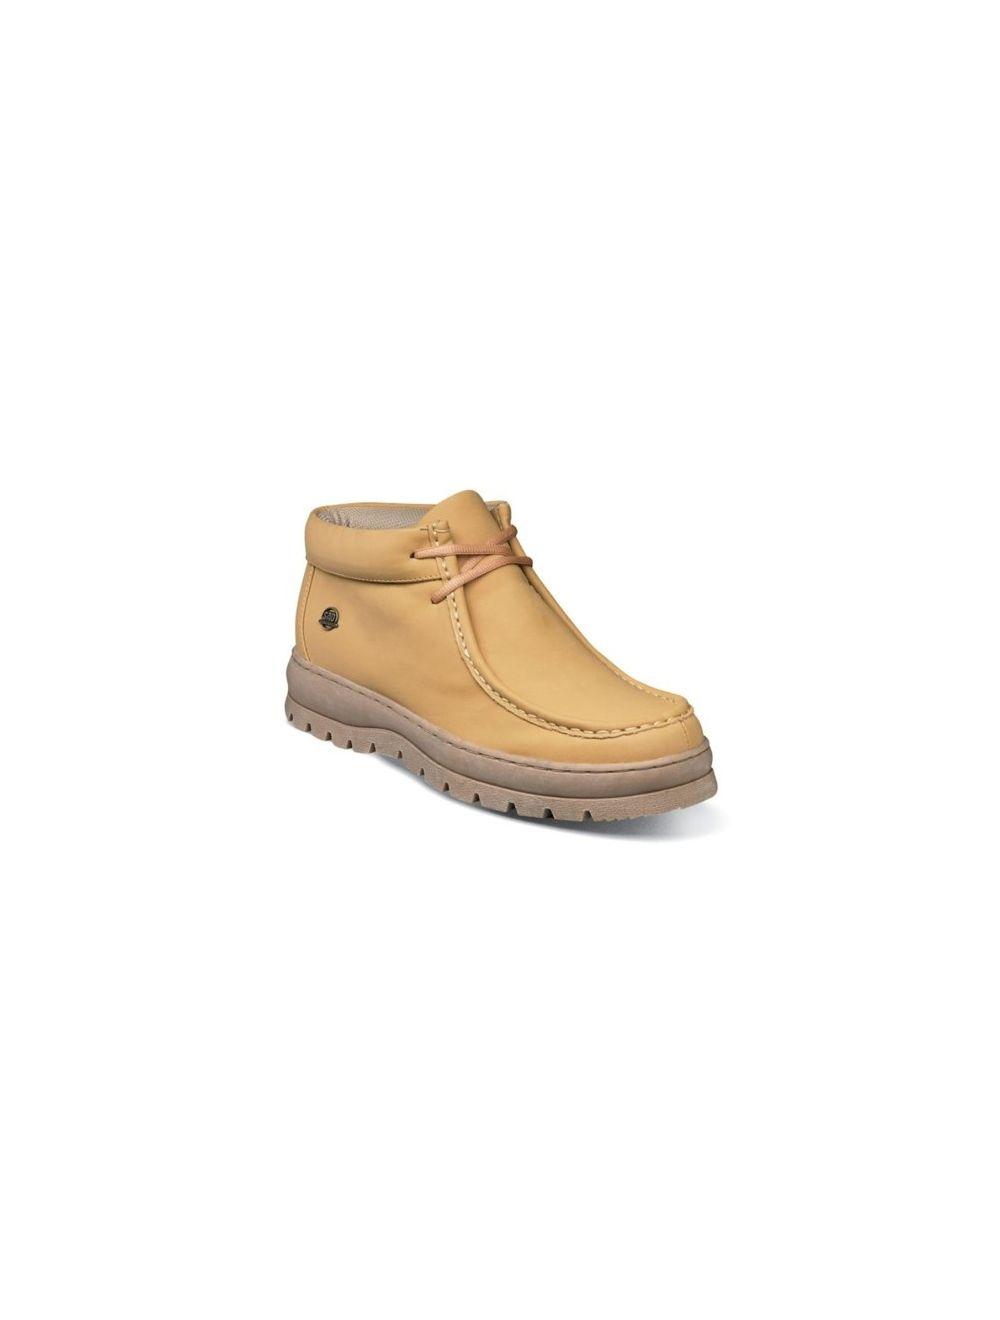 Stacy Adams Wally Moc-Toe Casual Boot